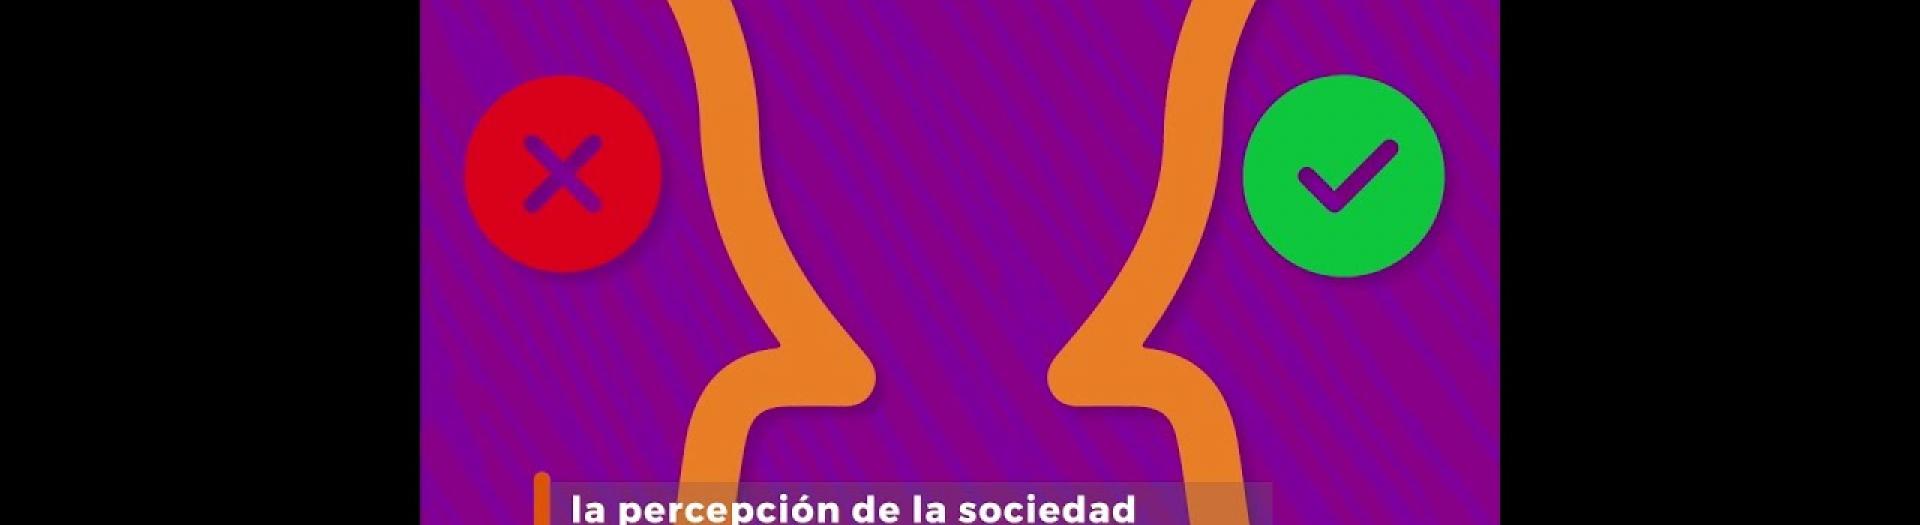 Embedded thumbnail for Migración indígena - IMAGO